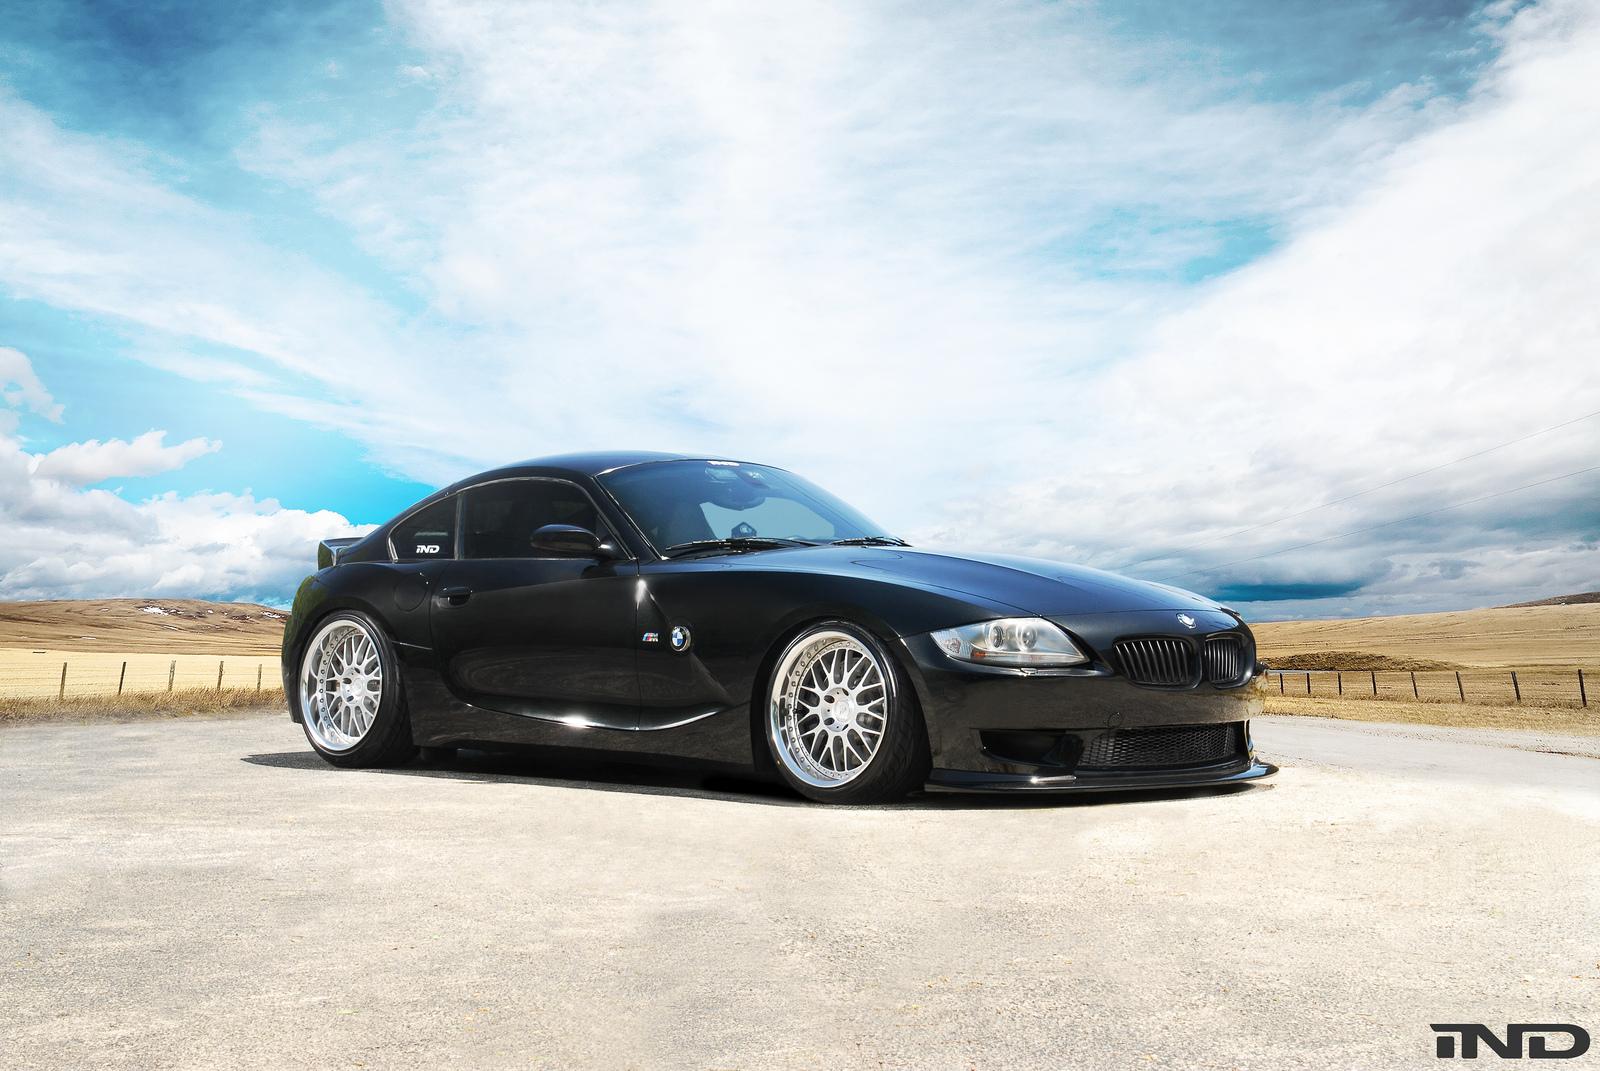 2006 Z4m Coupe Bsm